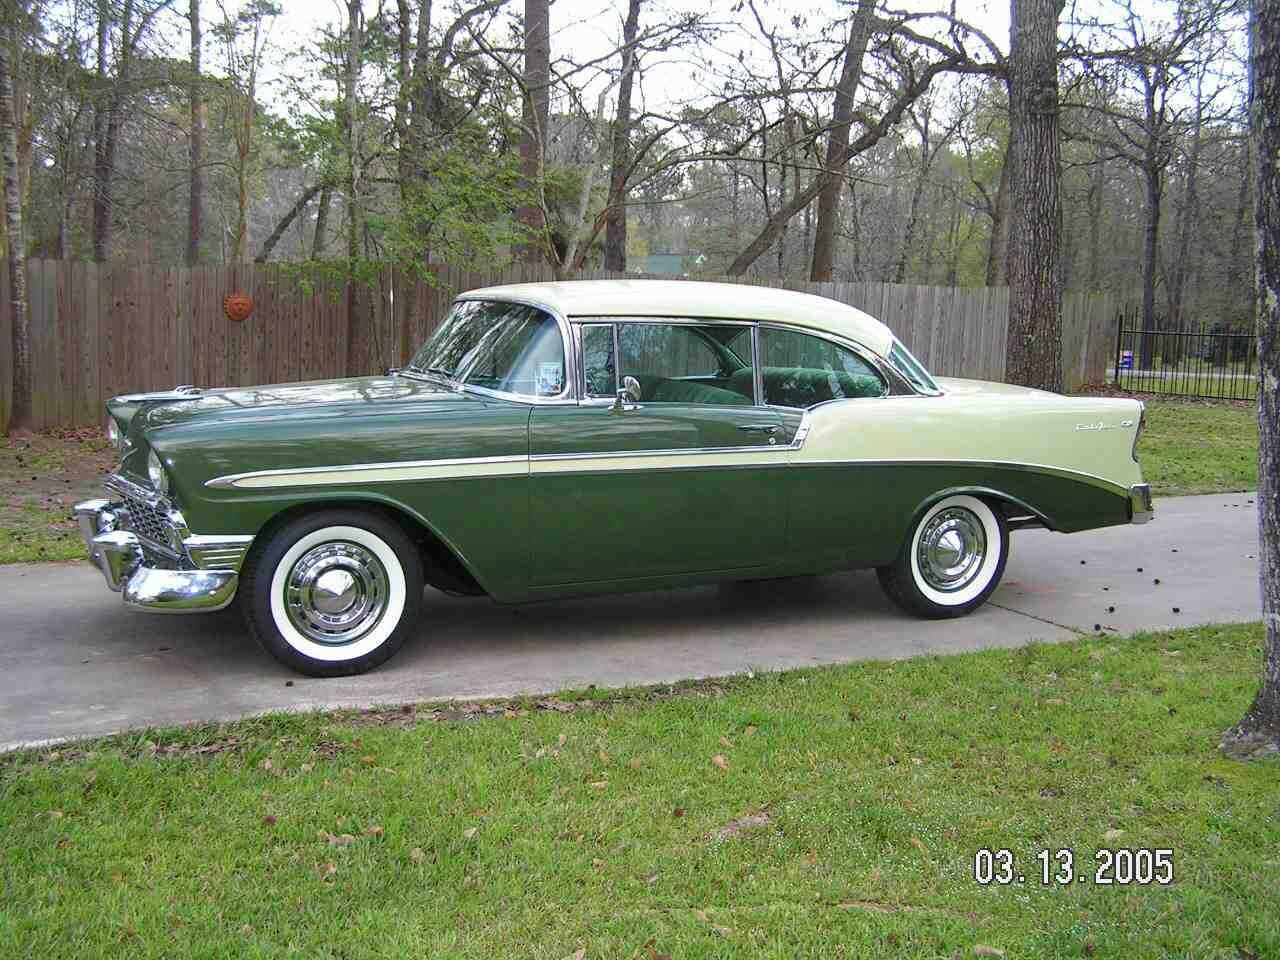 1956 Chevy Bel Air Hard Top 2 Door Chevy Bel Air Dream Cars Chevrolet Bel Air